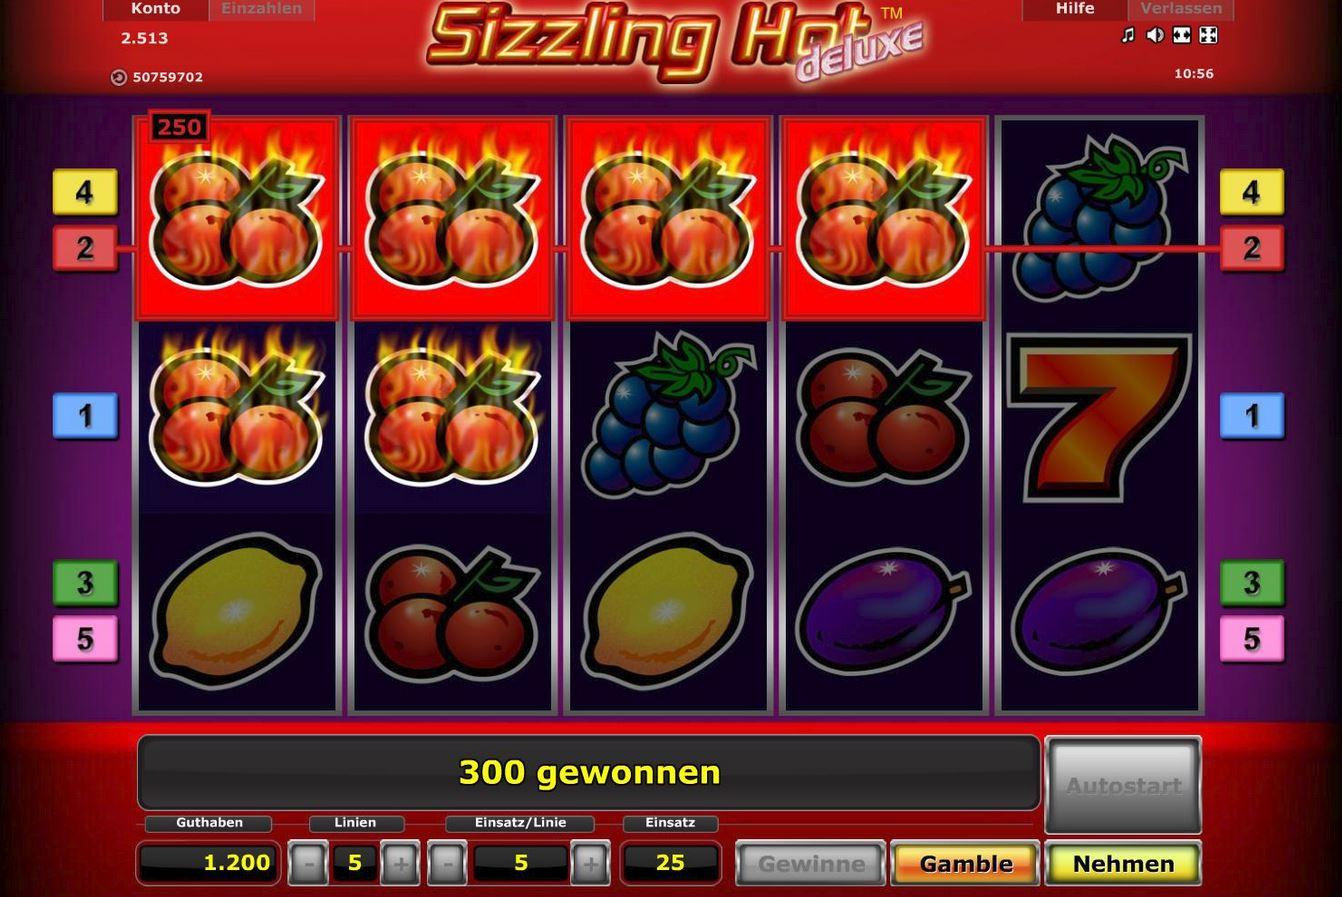 Sizzling Hot Spielen App